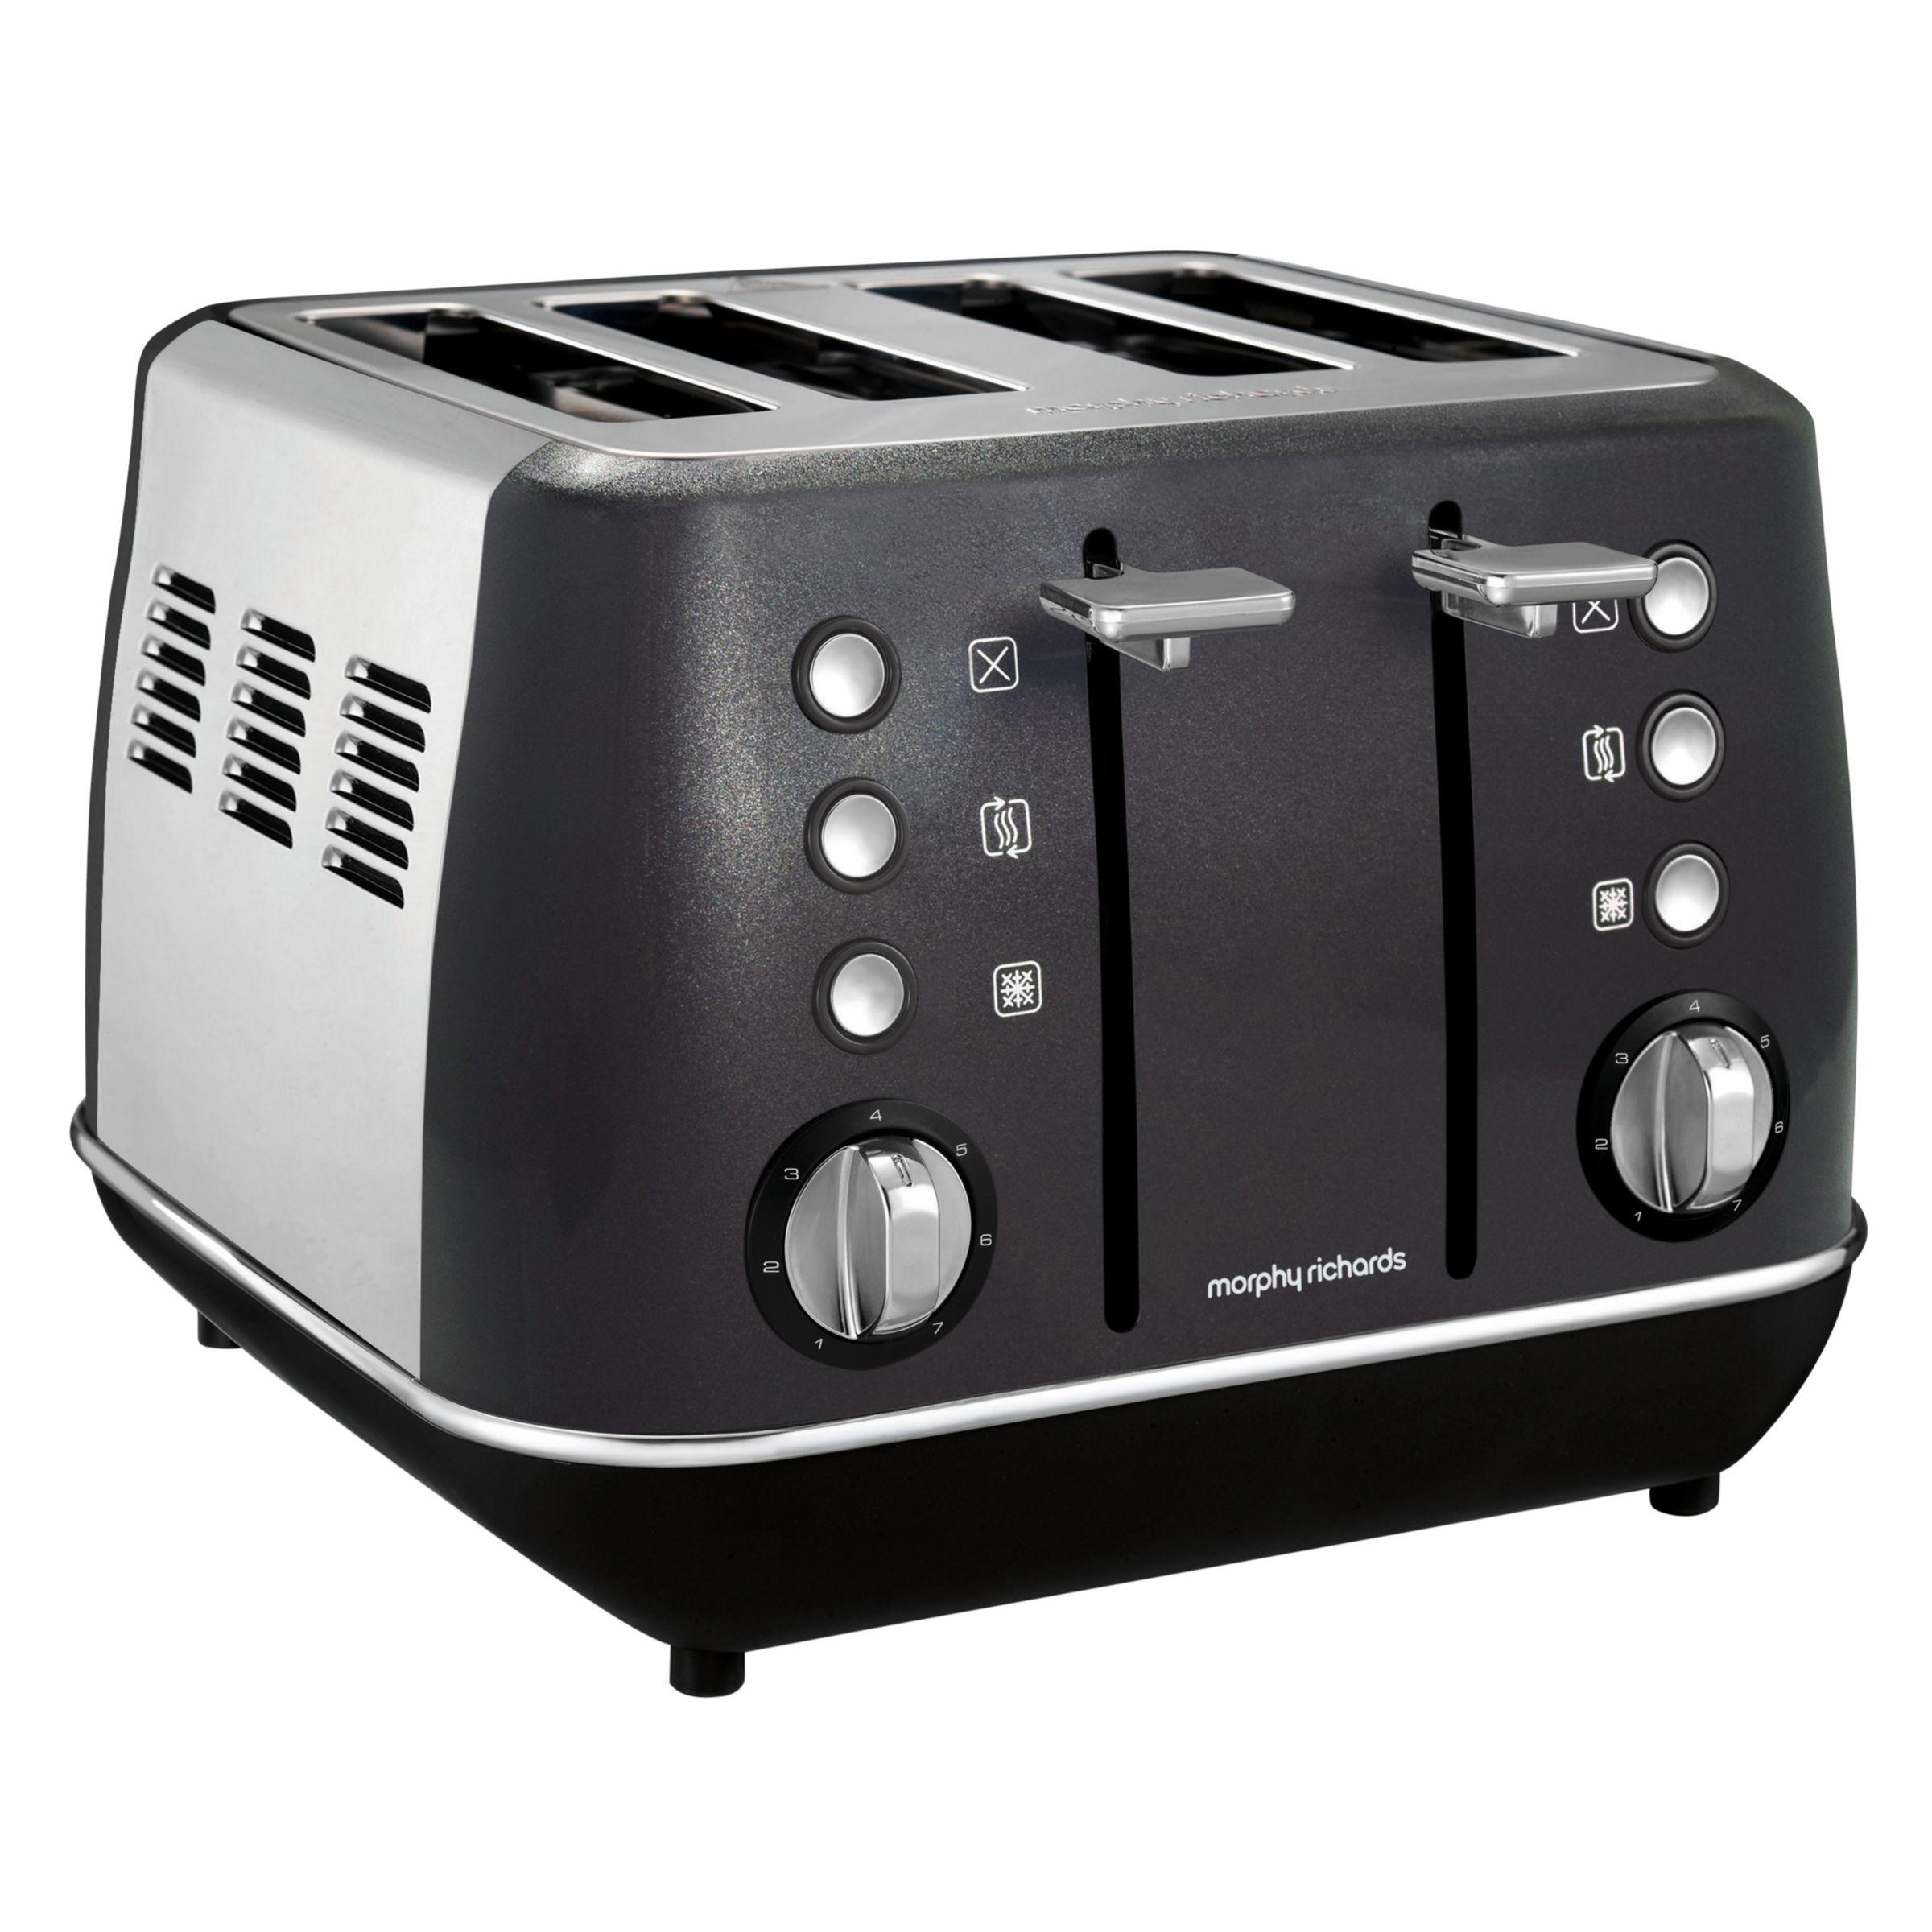 decker digital oven international toaster and black shop protrade